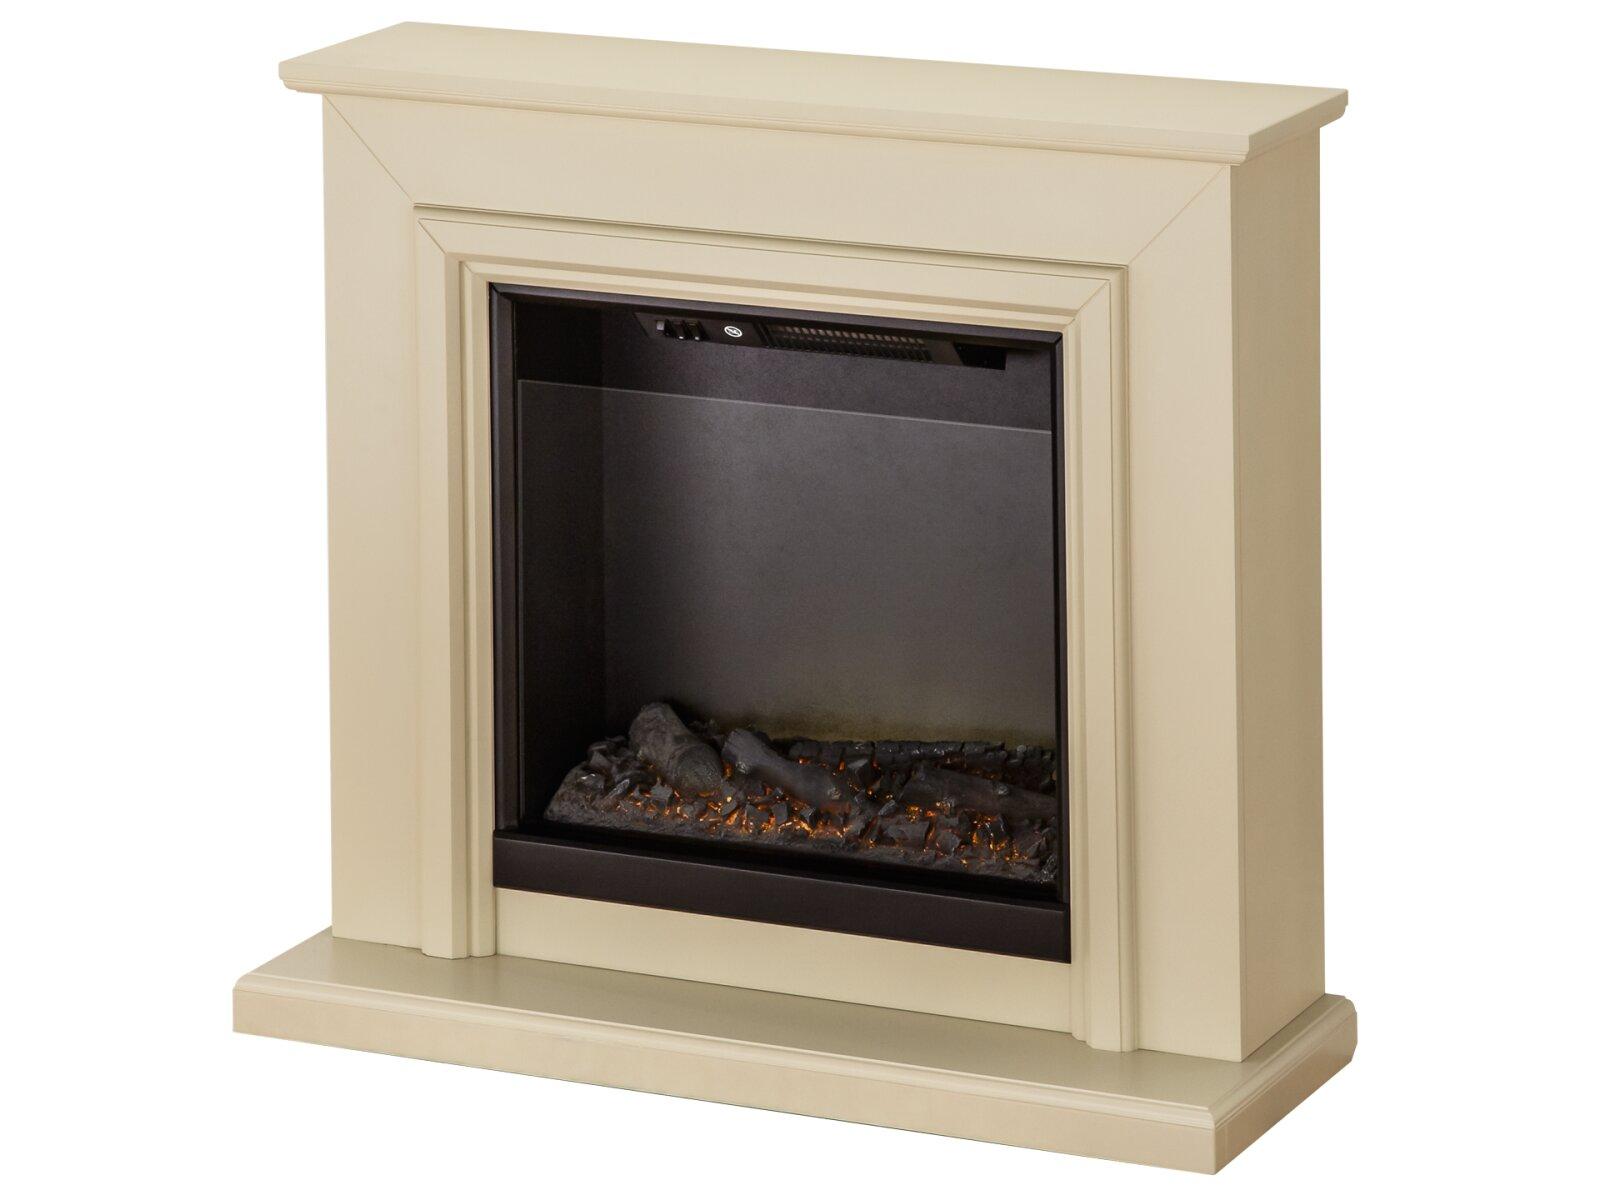 Adam Hampton Fireplace Suite In Stone Effect 39 Inch Fireplace World